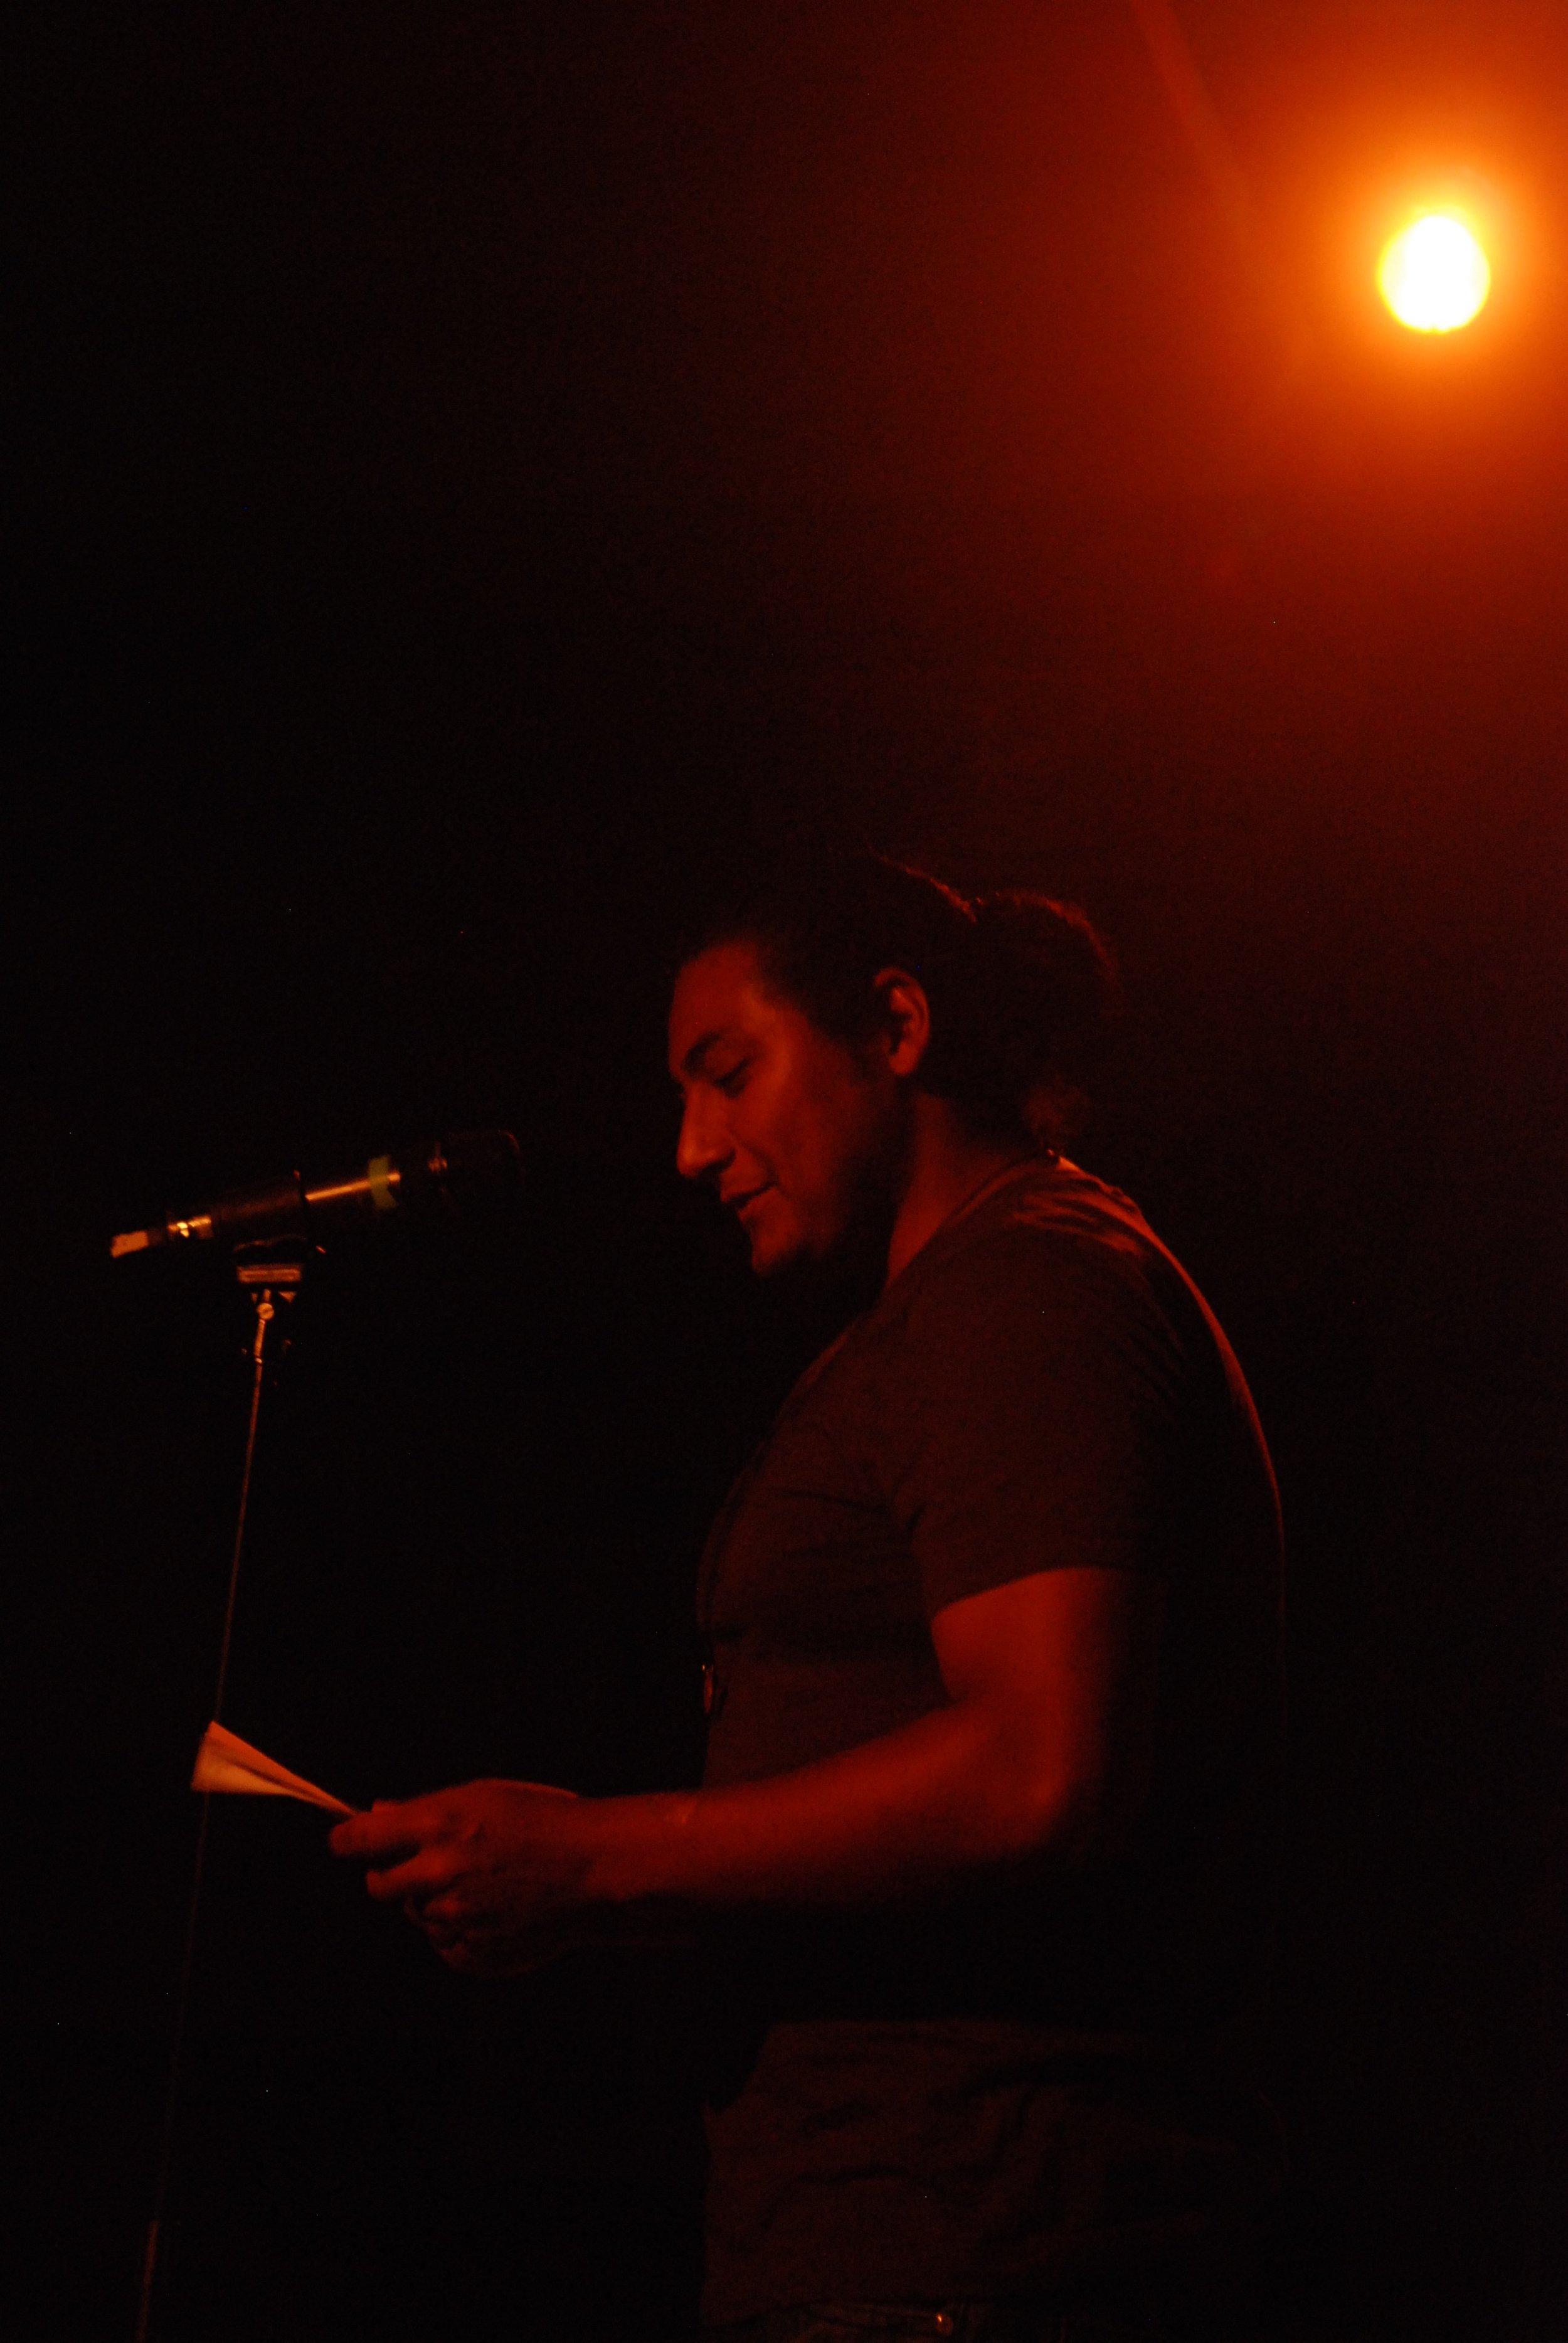 Stephen Acevedo